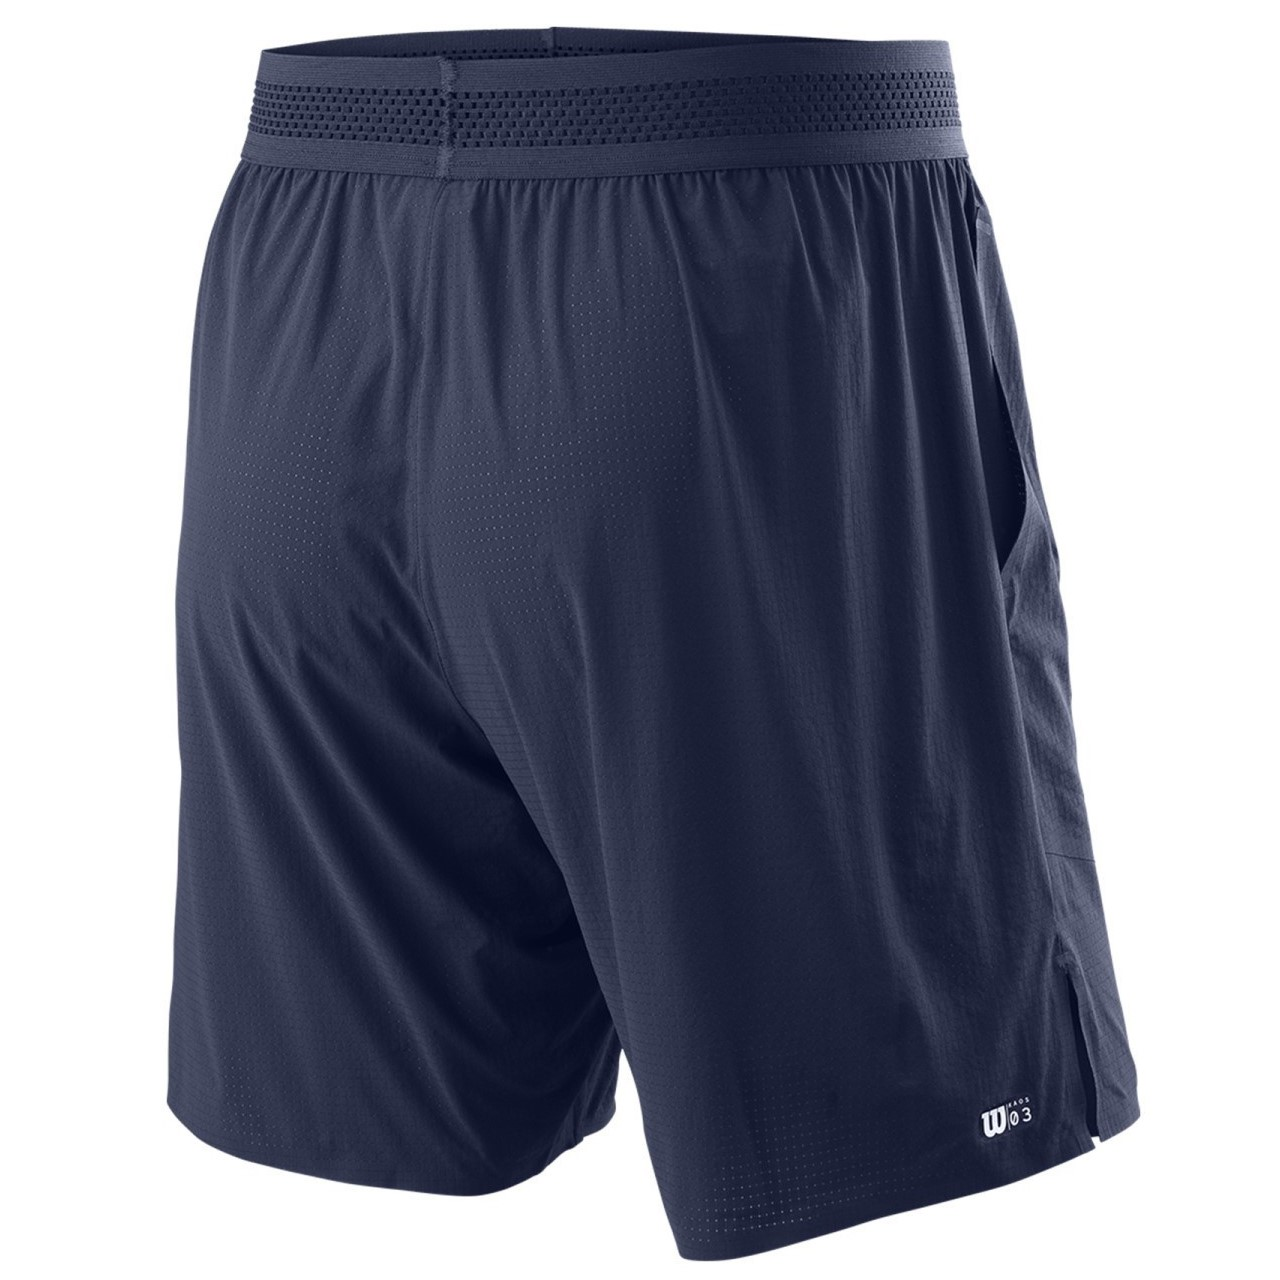 Wilson Kaos 7 Inch Mens Tennis Shorts – Peacoat